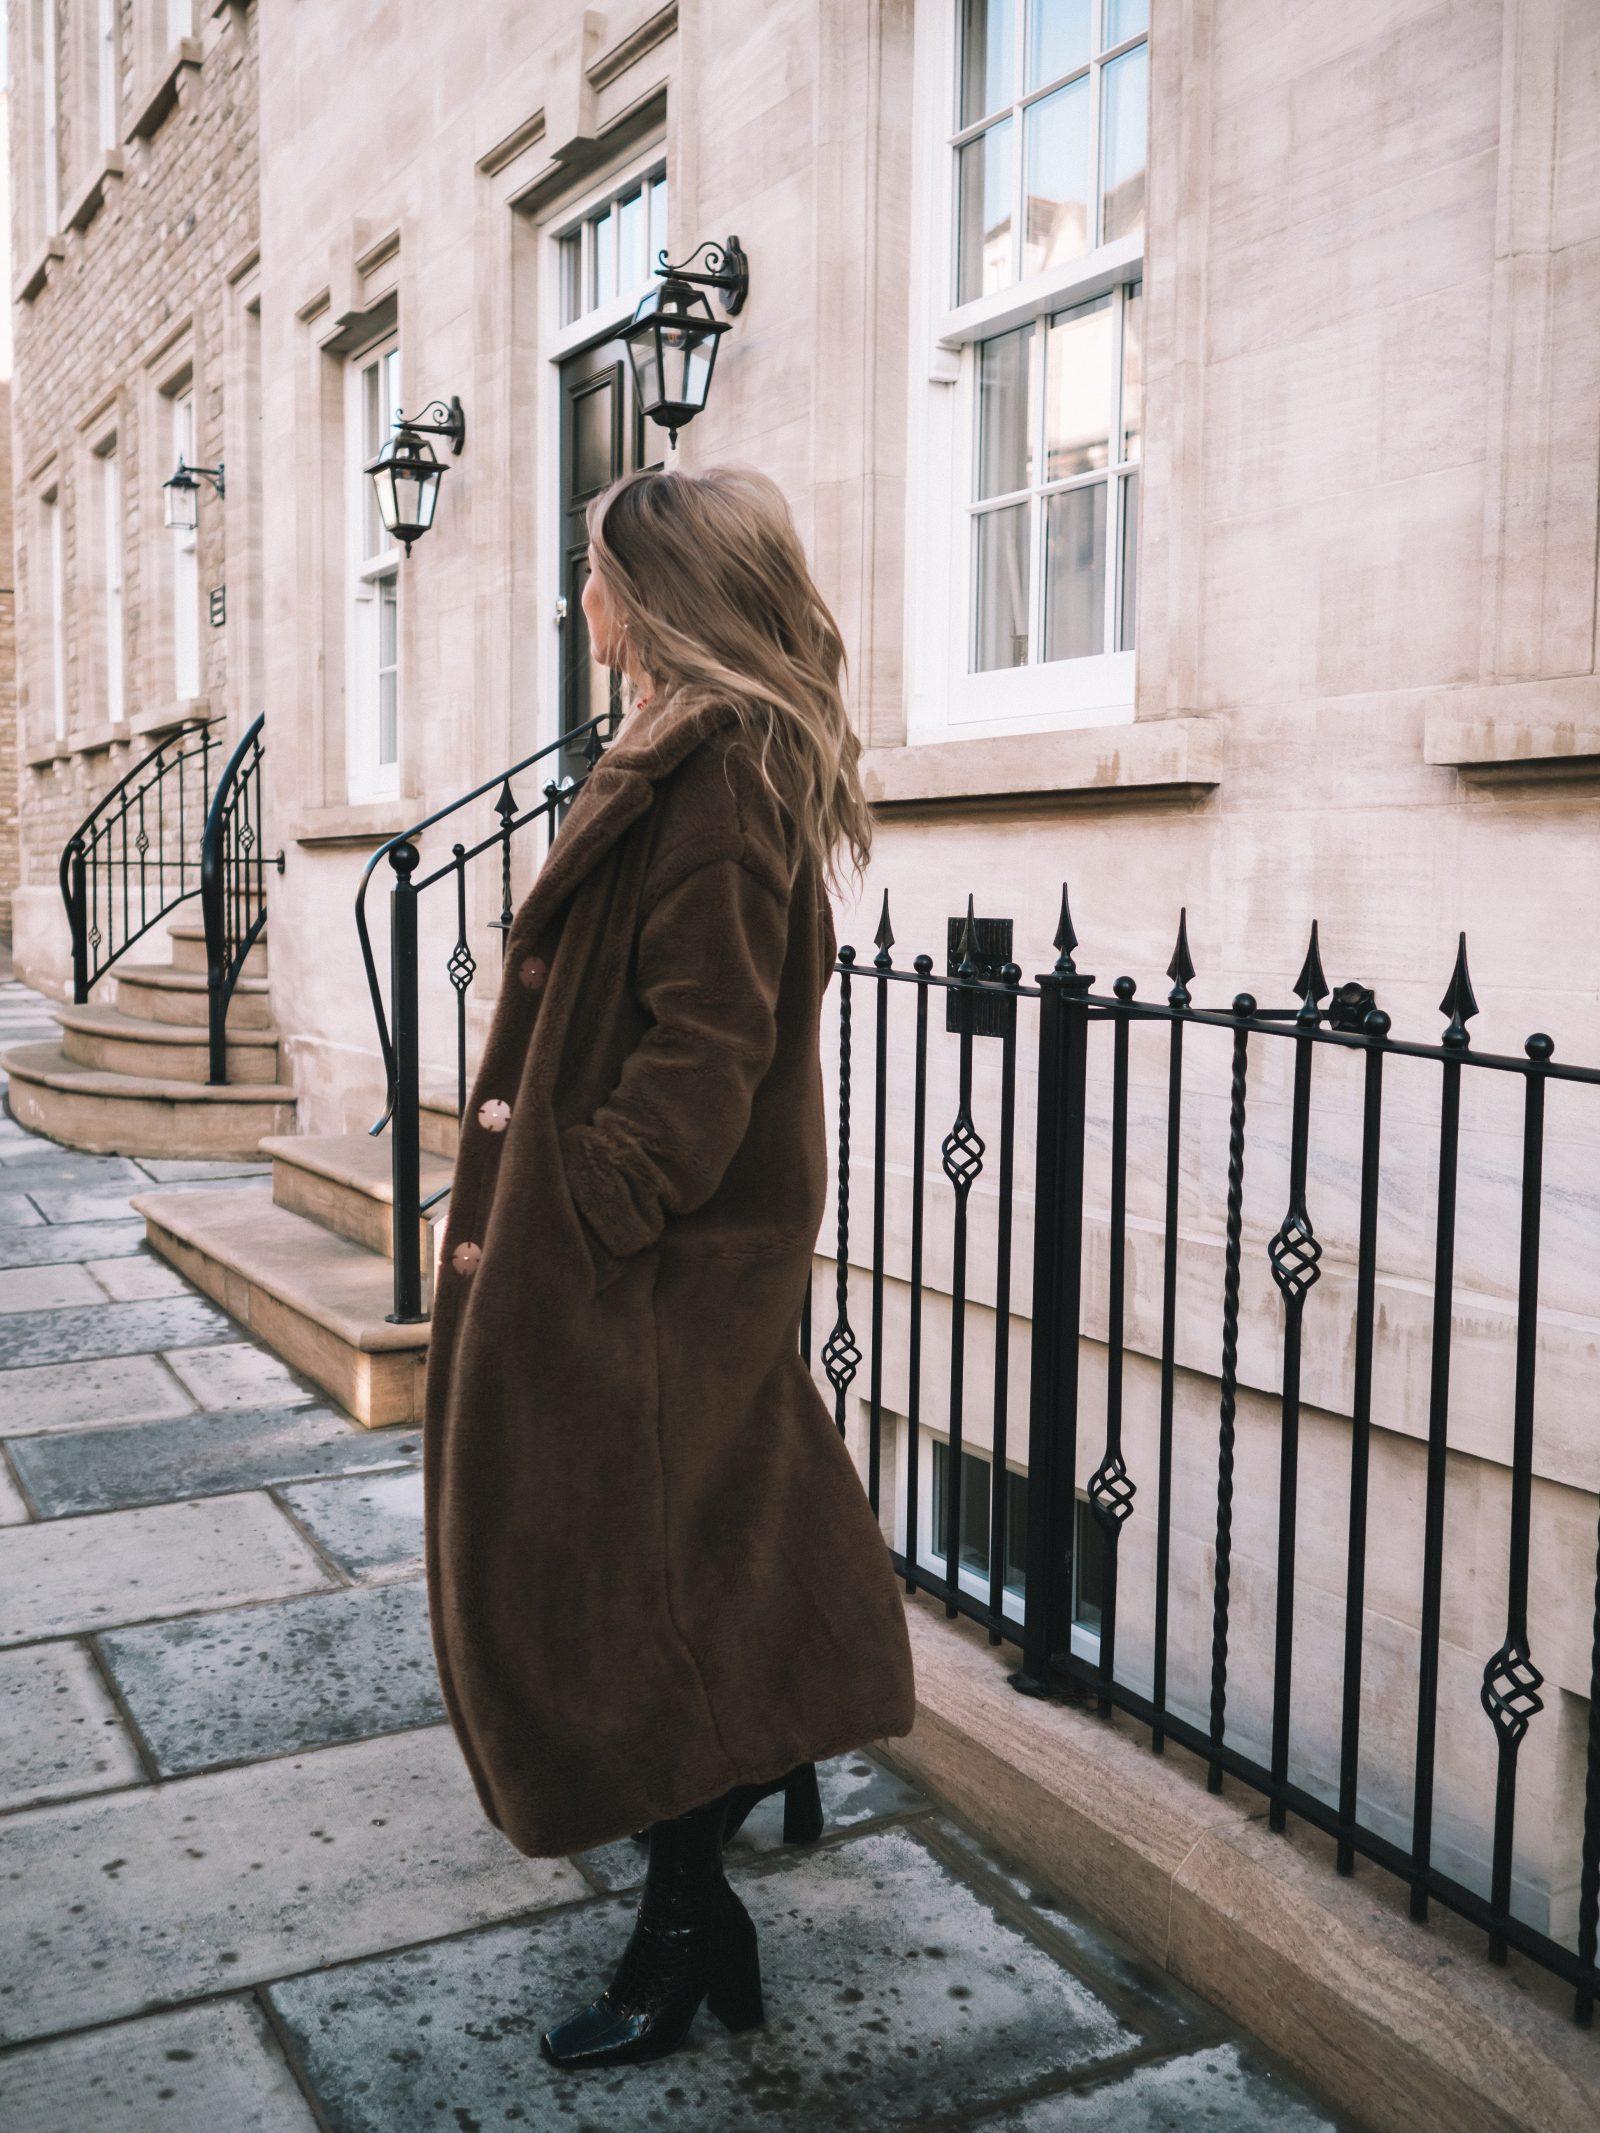 Warmest Coat - Warehouse Coat - Sinead Crowe Autumn Street Style